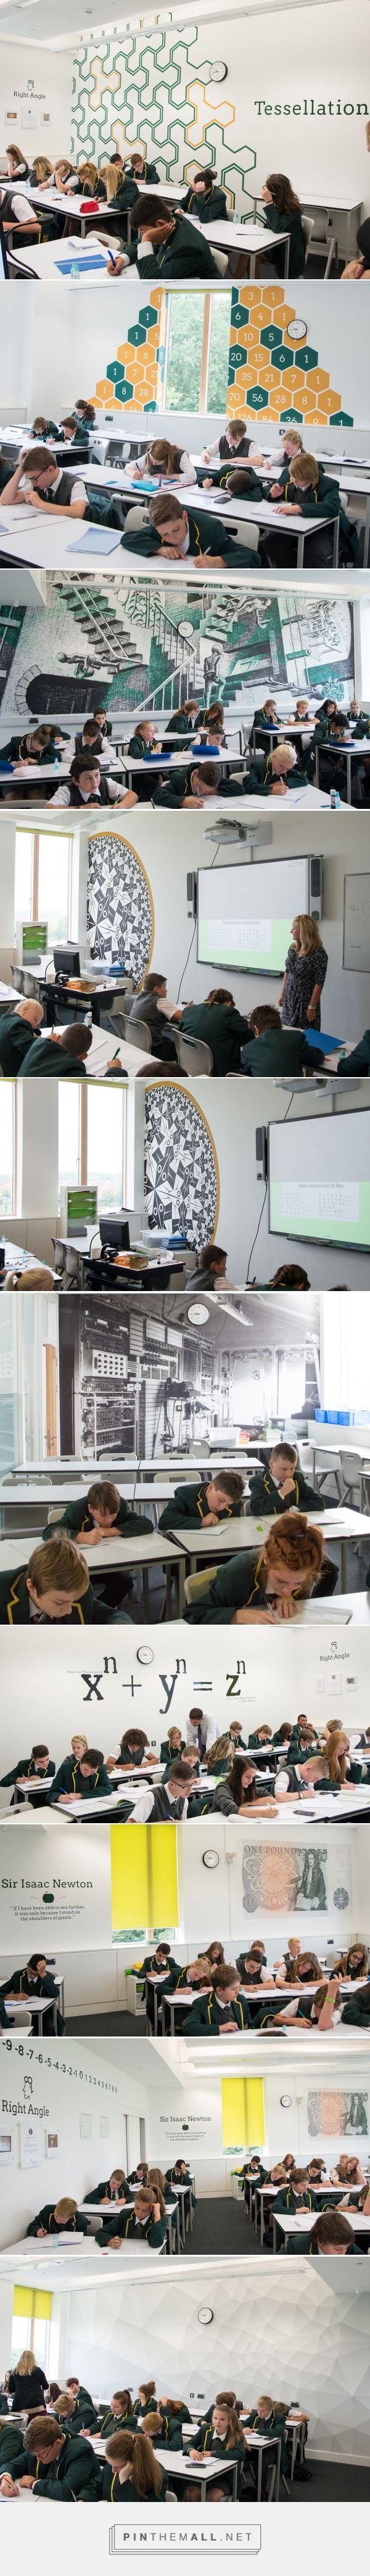 Worcester Maths Classroom Feature Walls on Behance - by TGdesign